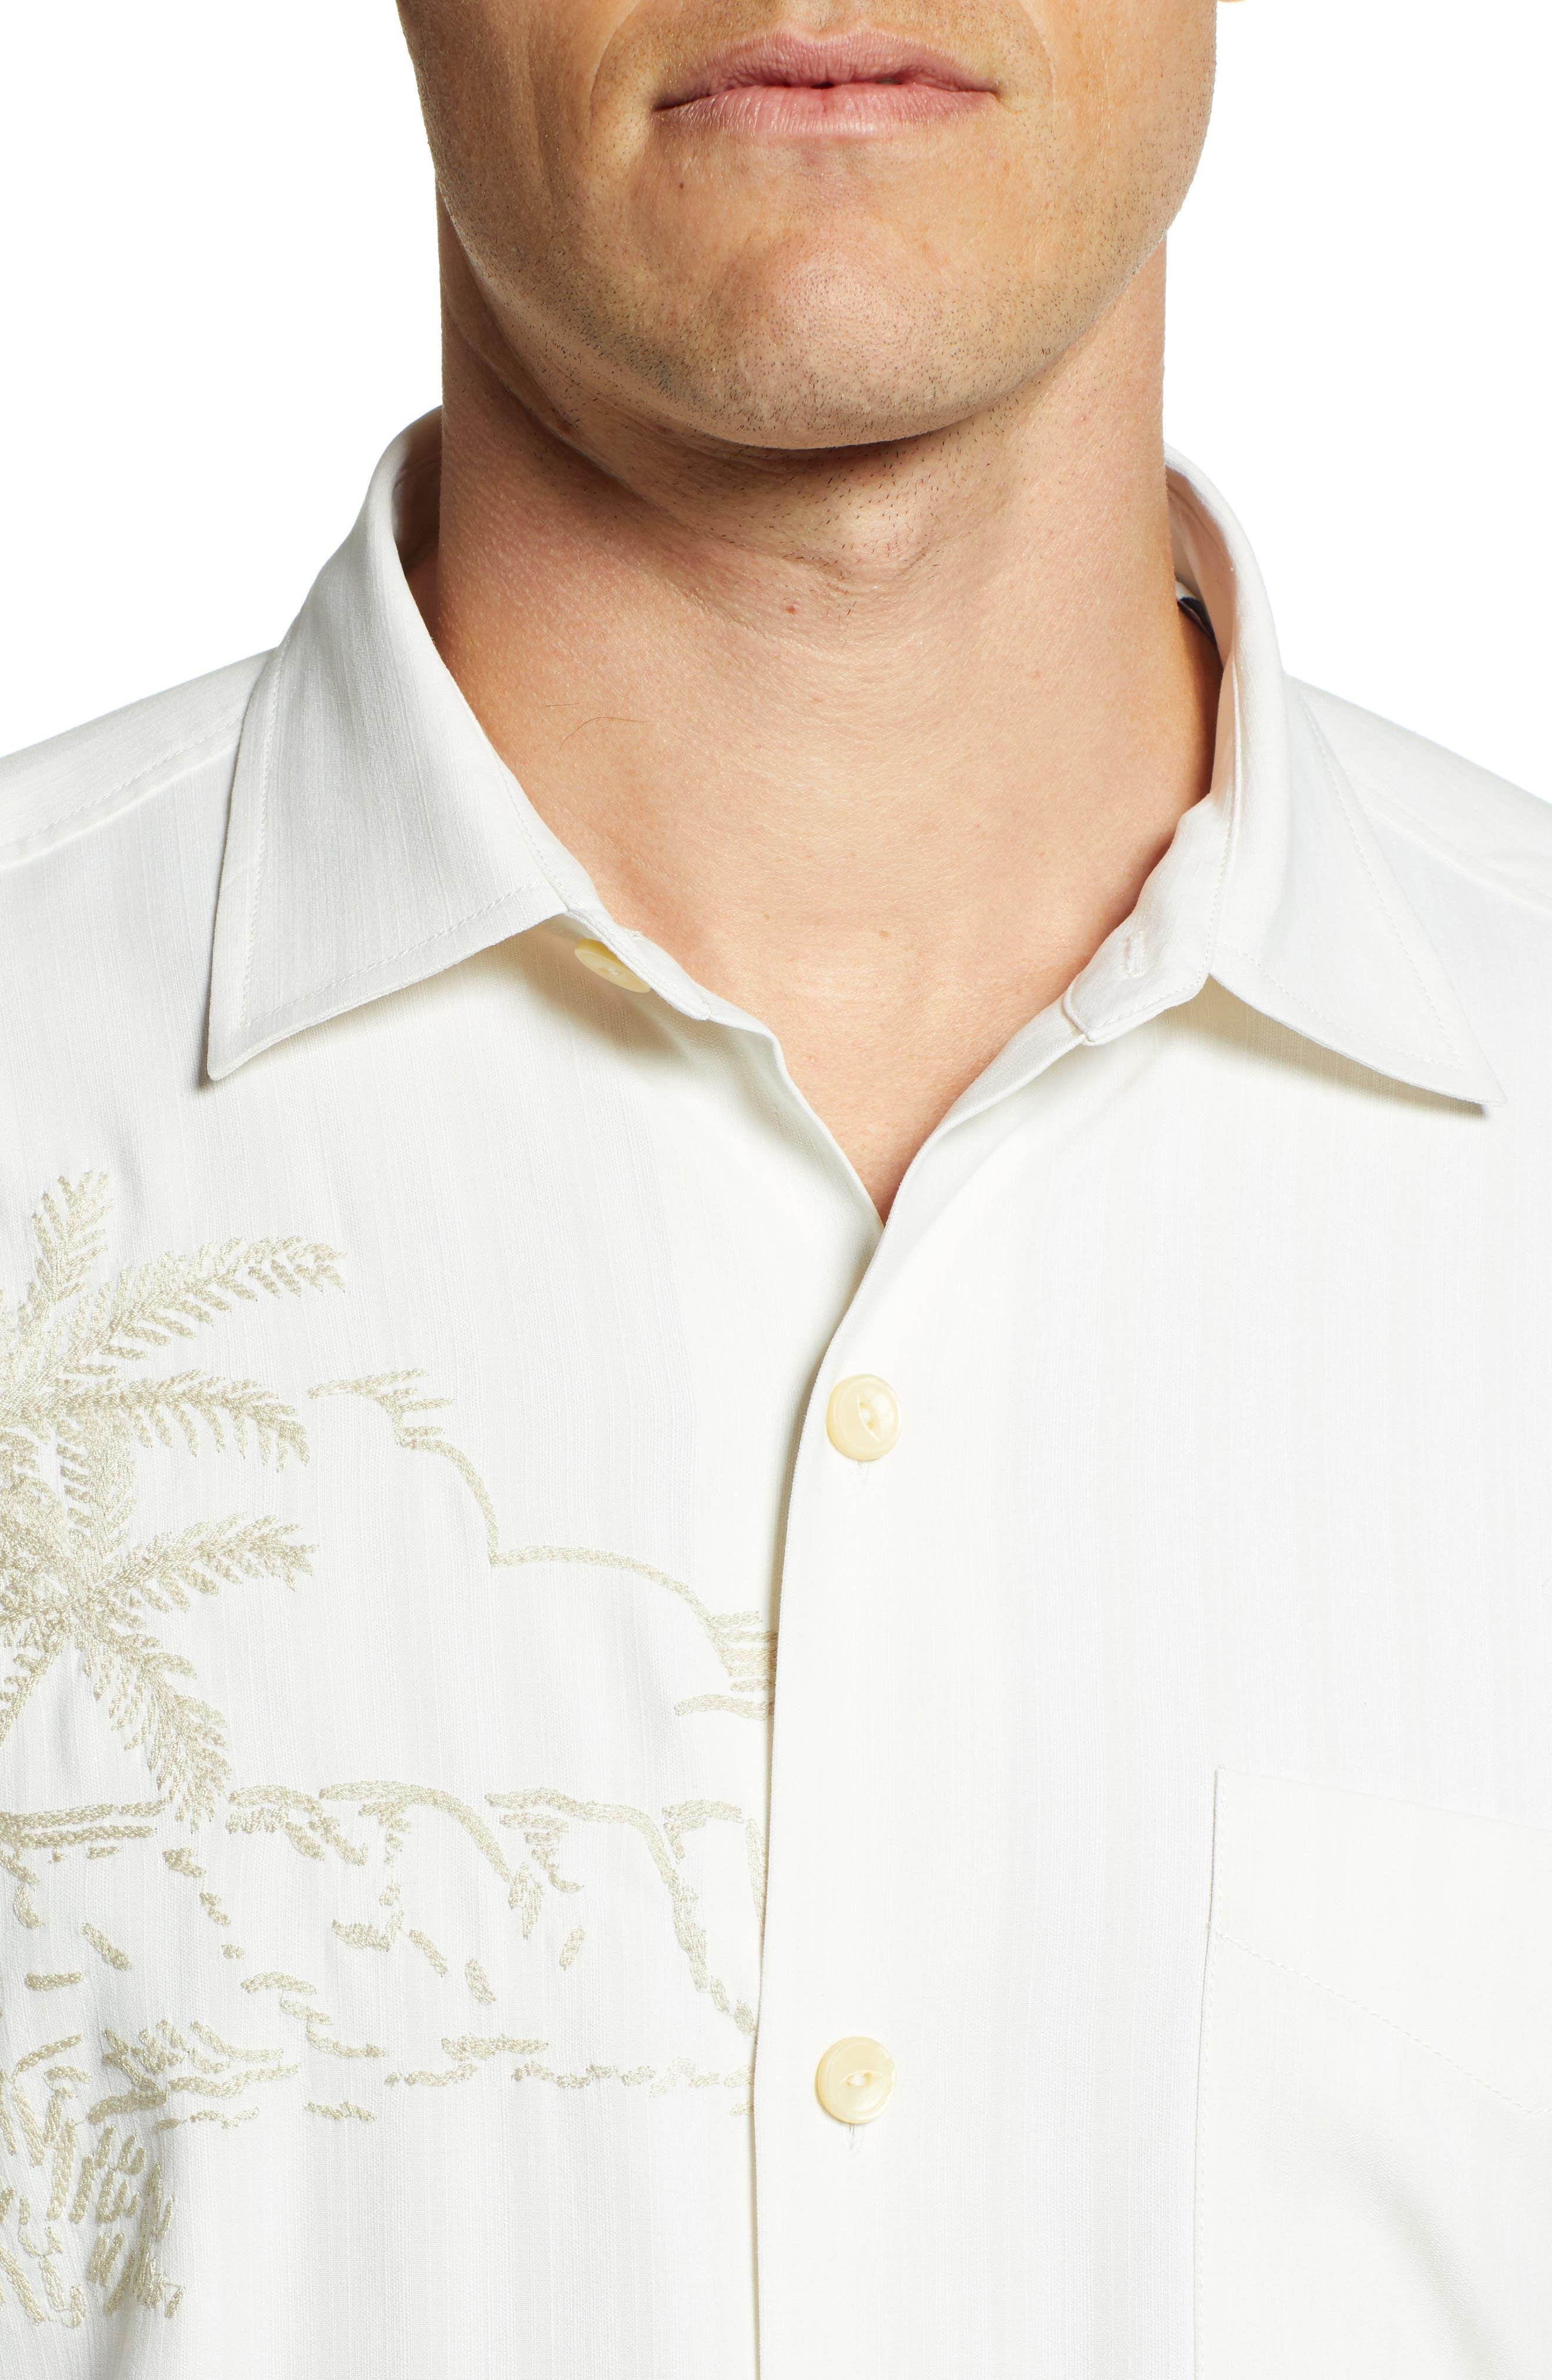 Las Playas Palms Silk Camp Shirt,                             Alternate thumbnail 4, color,                             TWILL